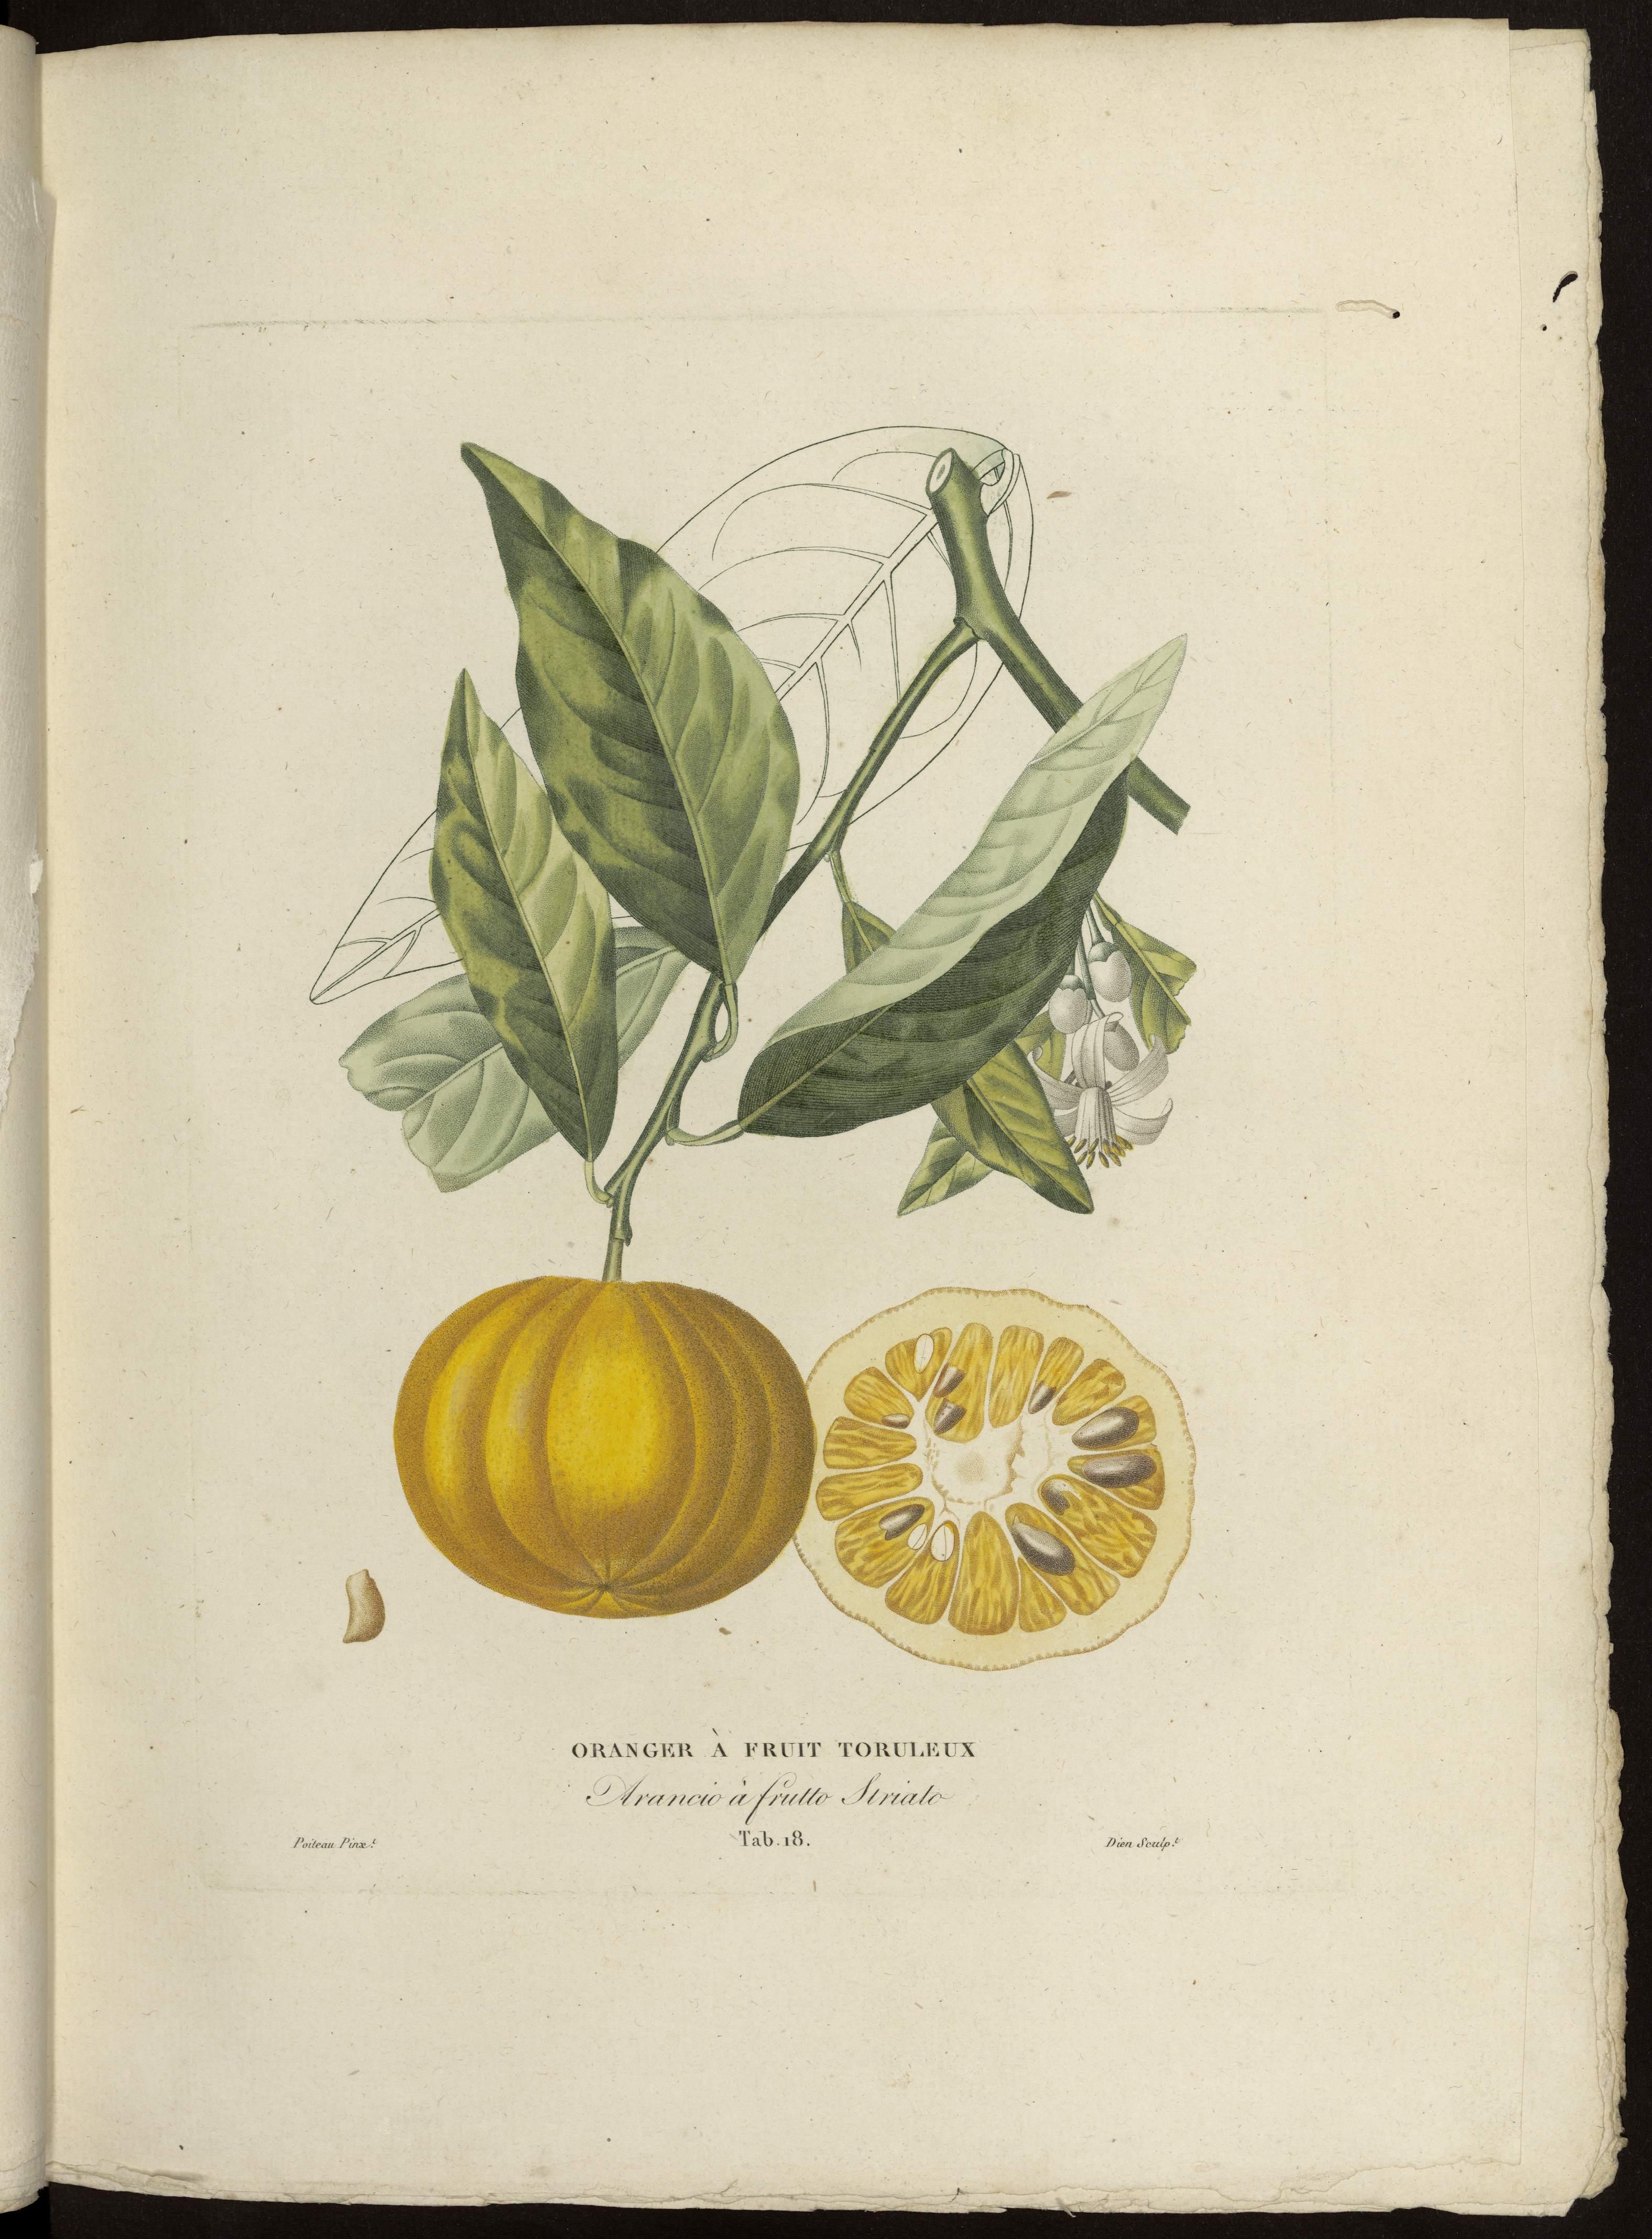 oranger à fruit toruleux